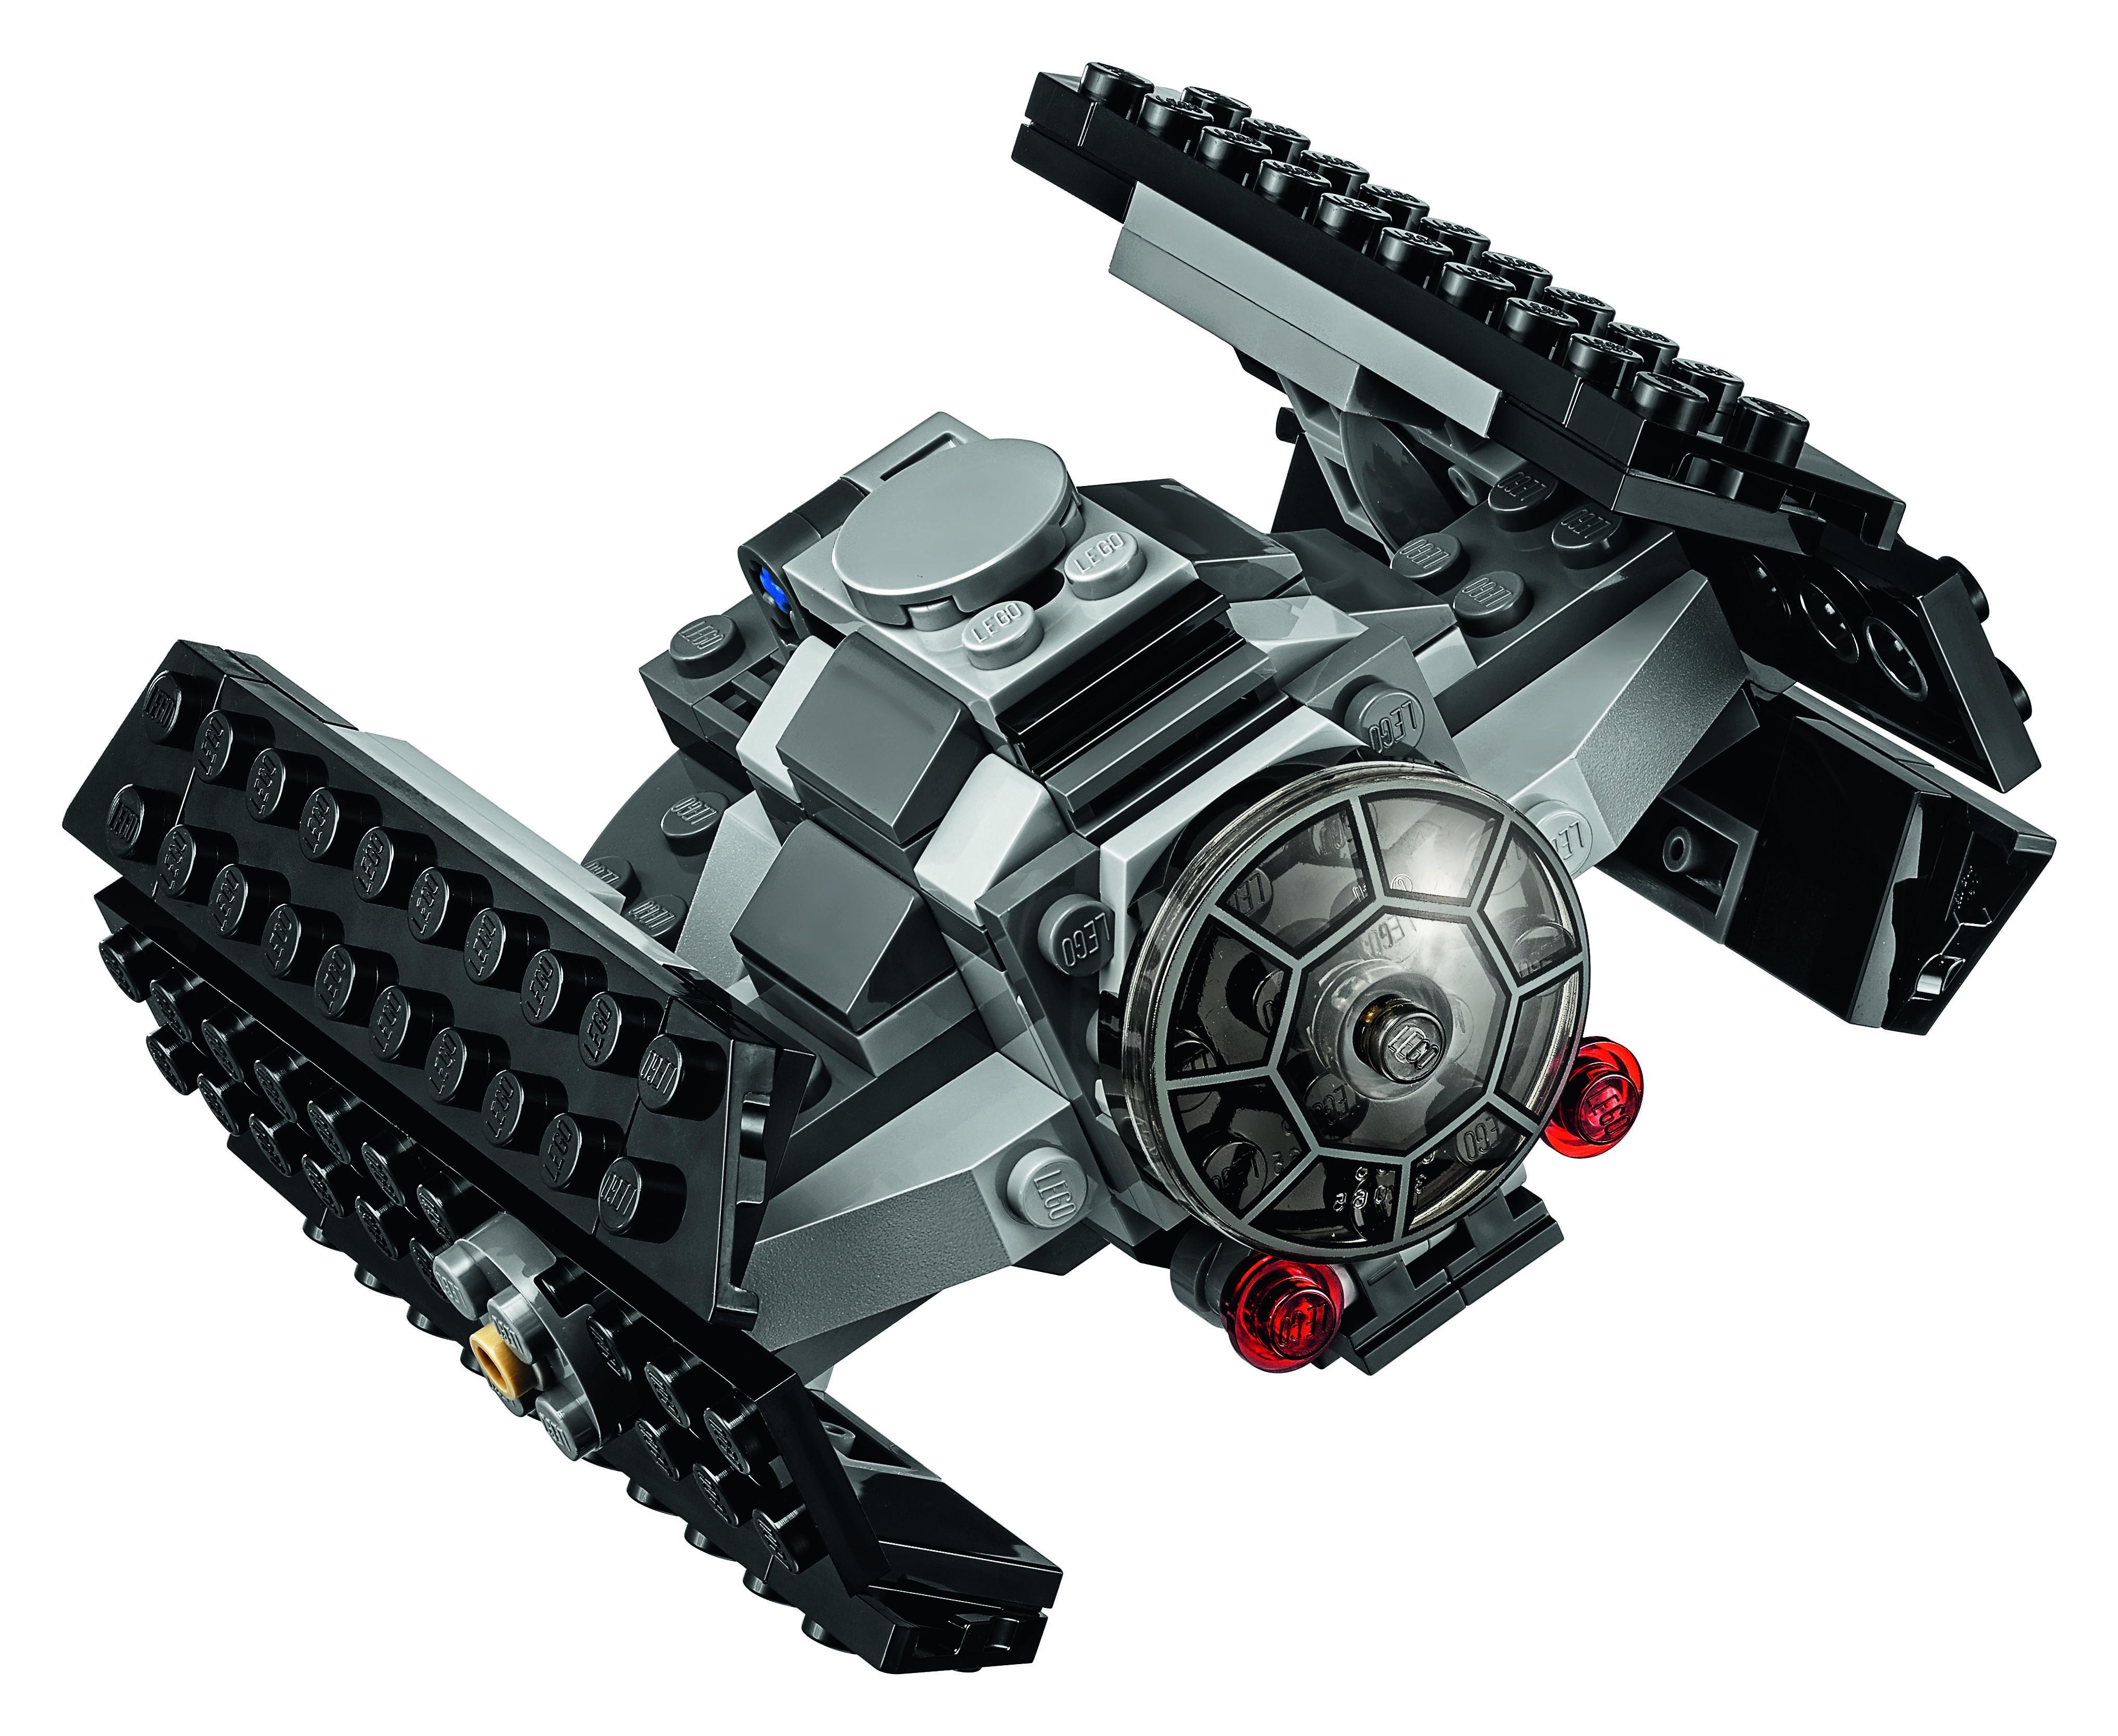 Lego Star Wars Ucs Death Star 75159 6 The Brick Fan